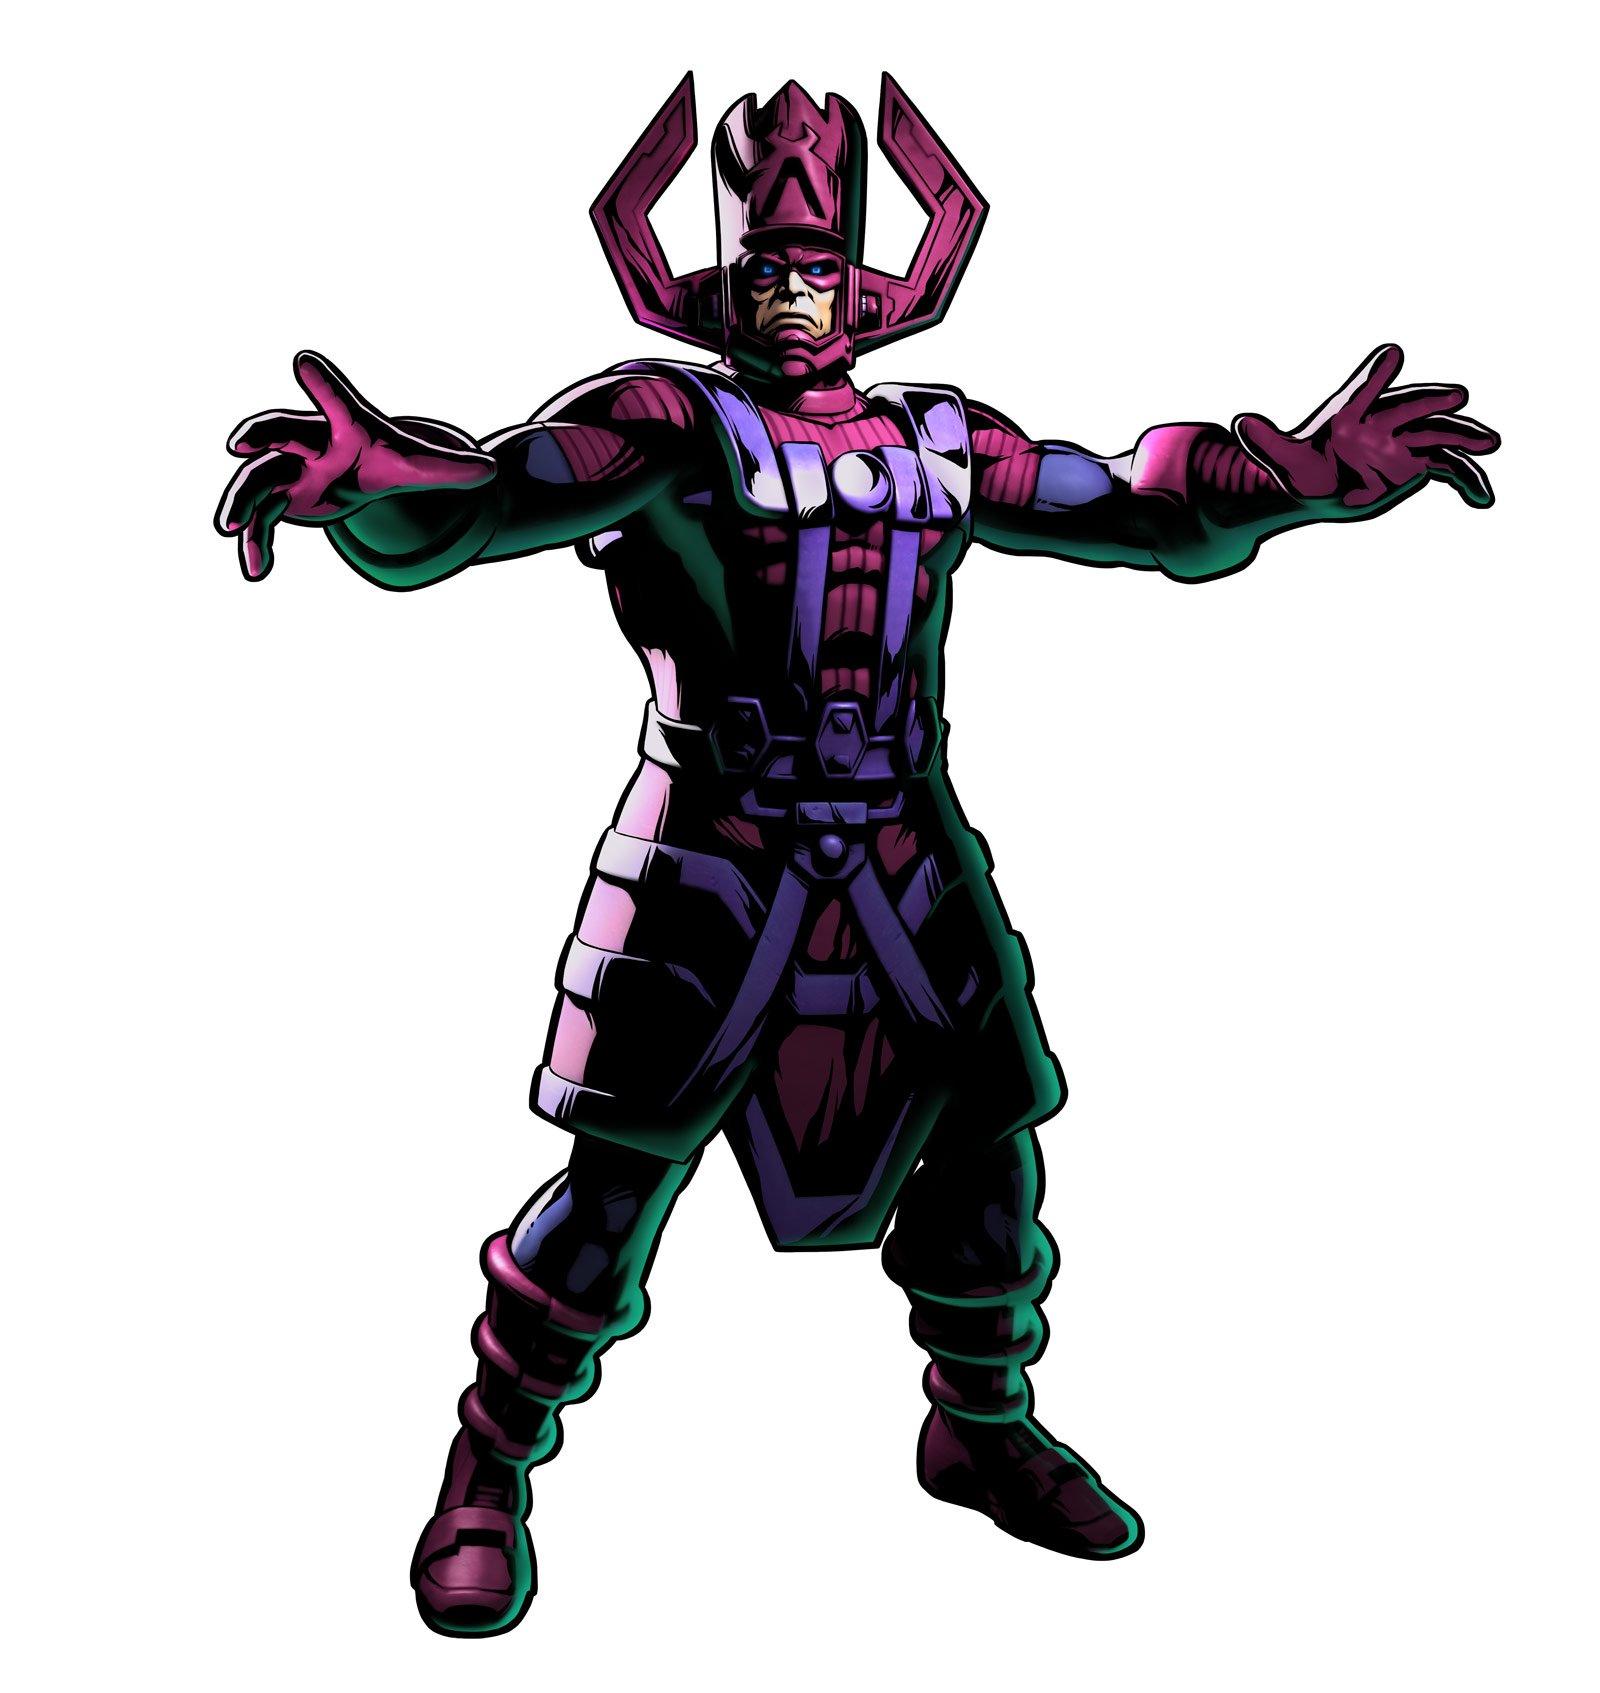 Wallpaper Superhero Marvel 3d Galactus Mvc3